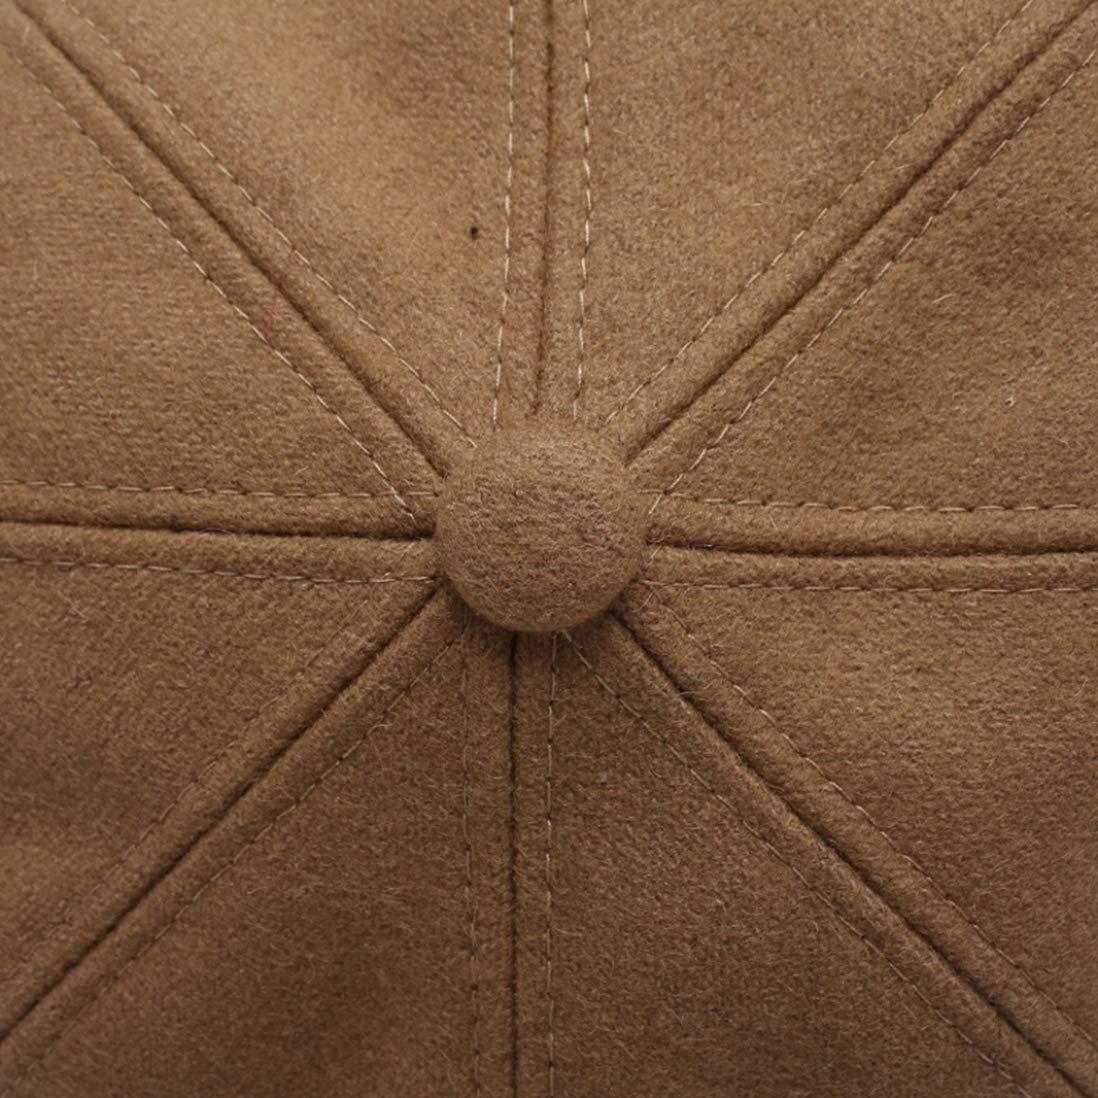 Women Winter Wool Newsboy Caps Vintage Solid Color Octagonal Hats Female Autumn Berets Hat Chapeau